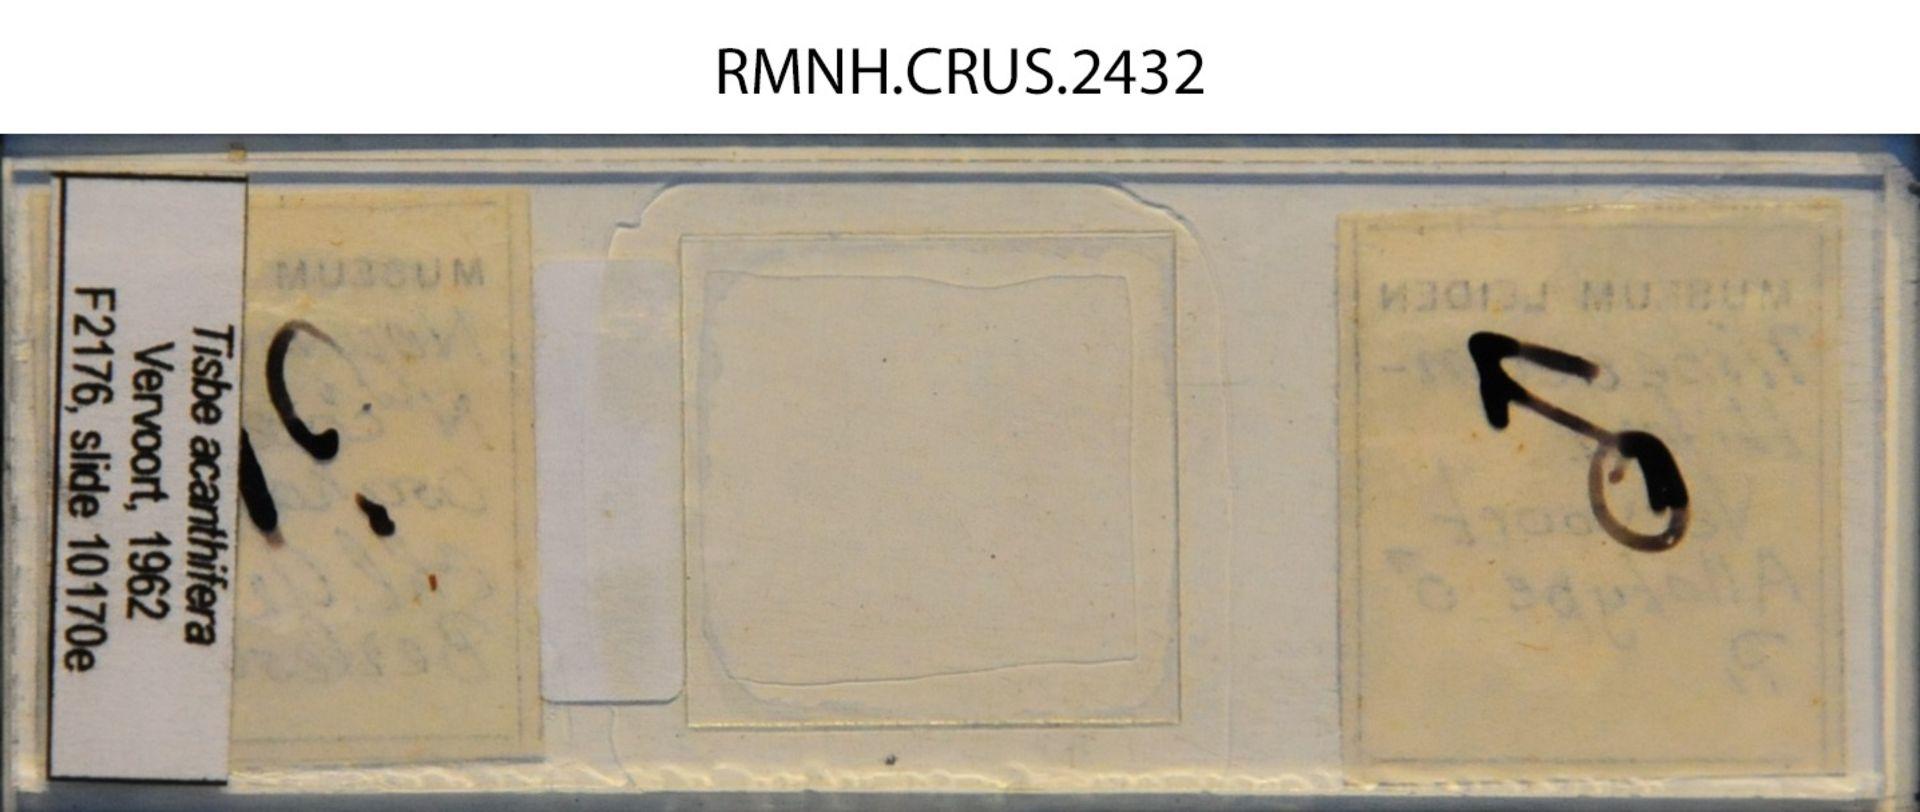 RMNH.CRUS.2432   Tisbe acanthifera Vervoort, 1962